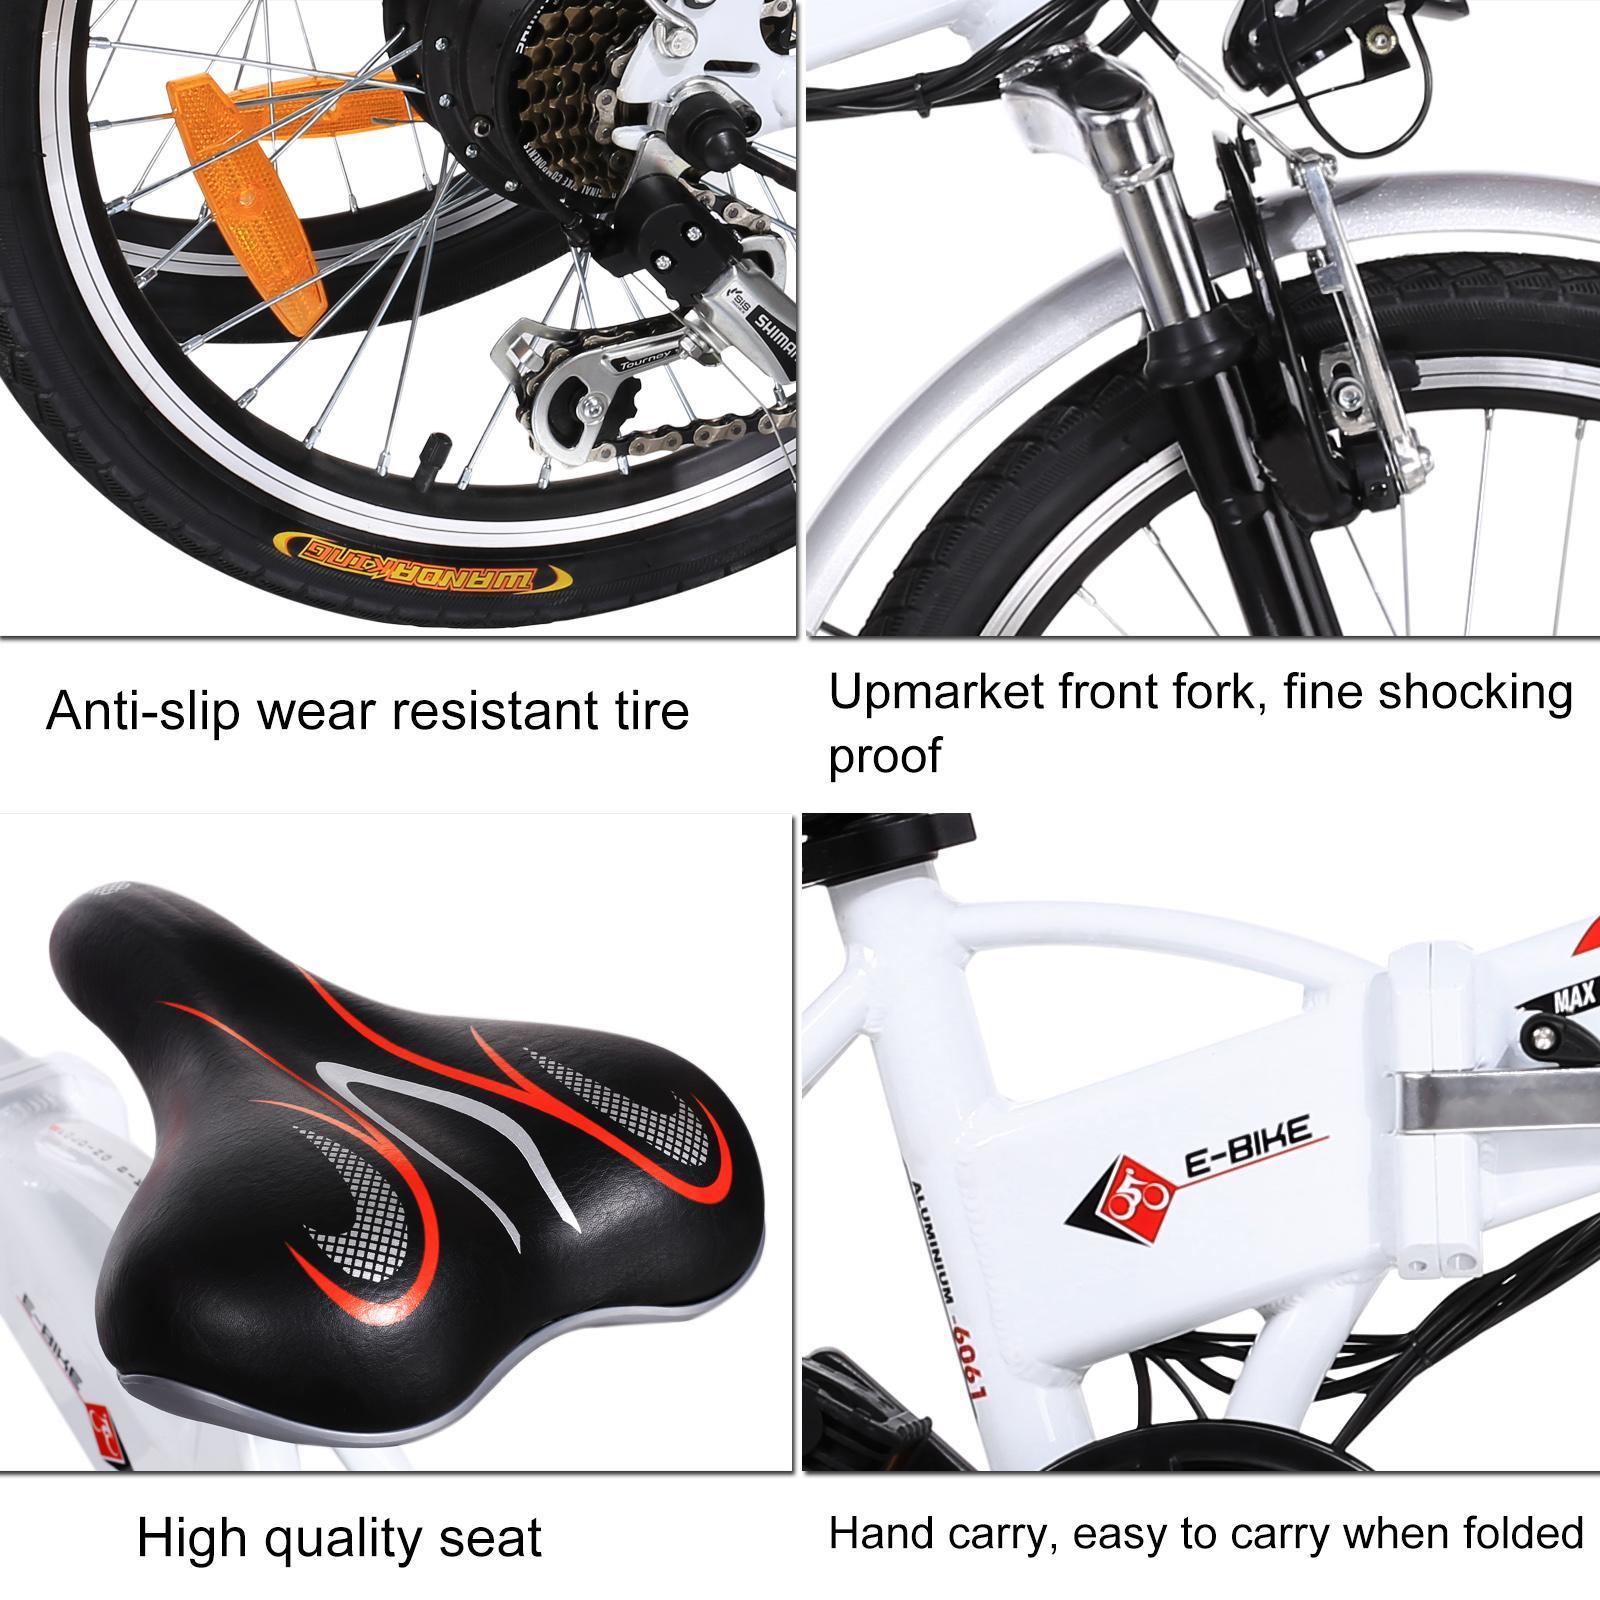 18.7 inch Wheel Aluminum Alloy Frame Folding Mountain Bike Cycling Bicycle White 4